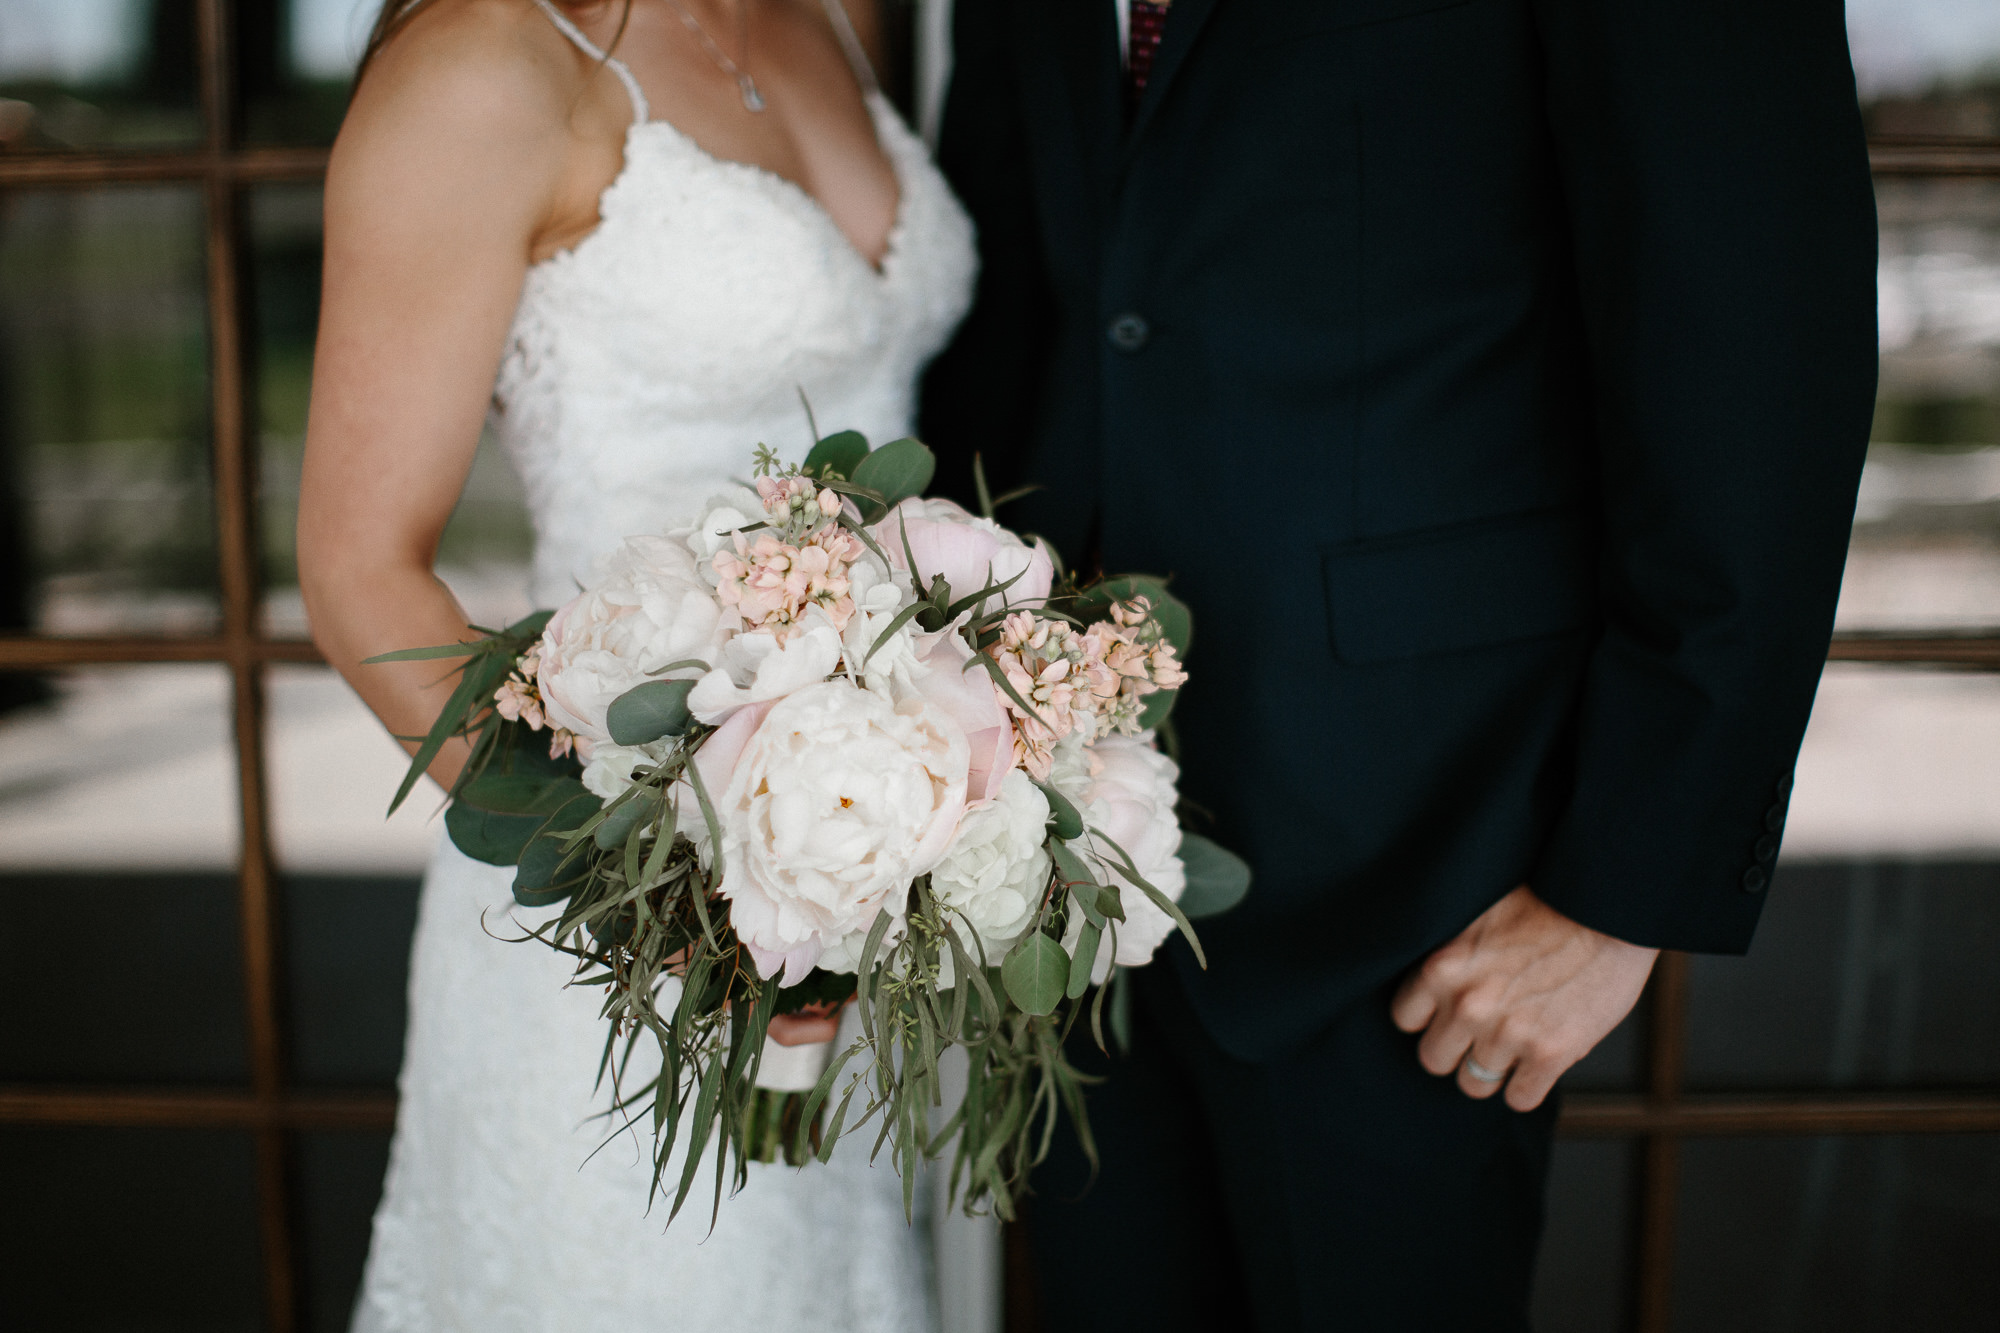 wedding-elopement-adventerous-romantic-timeless-south-dakota-blue-haven-barn-026.jpg